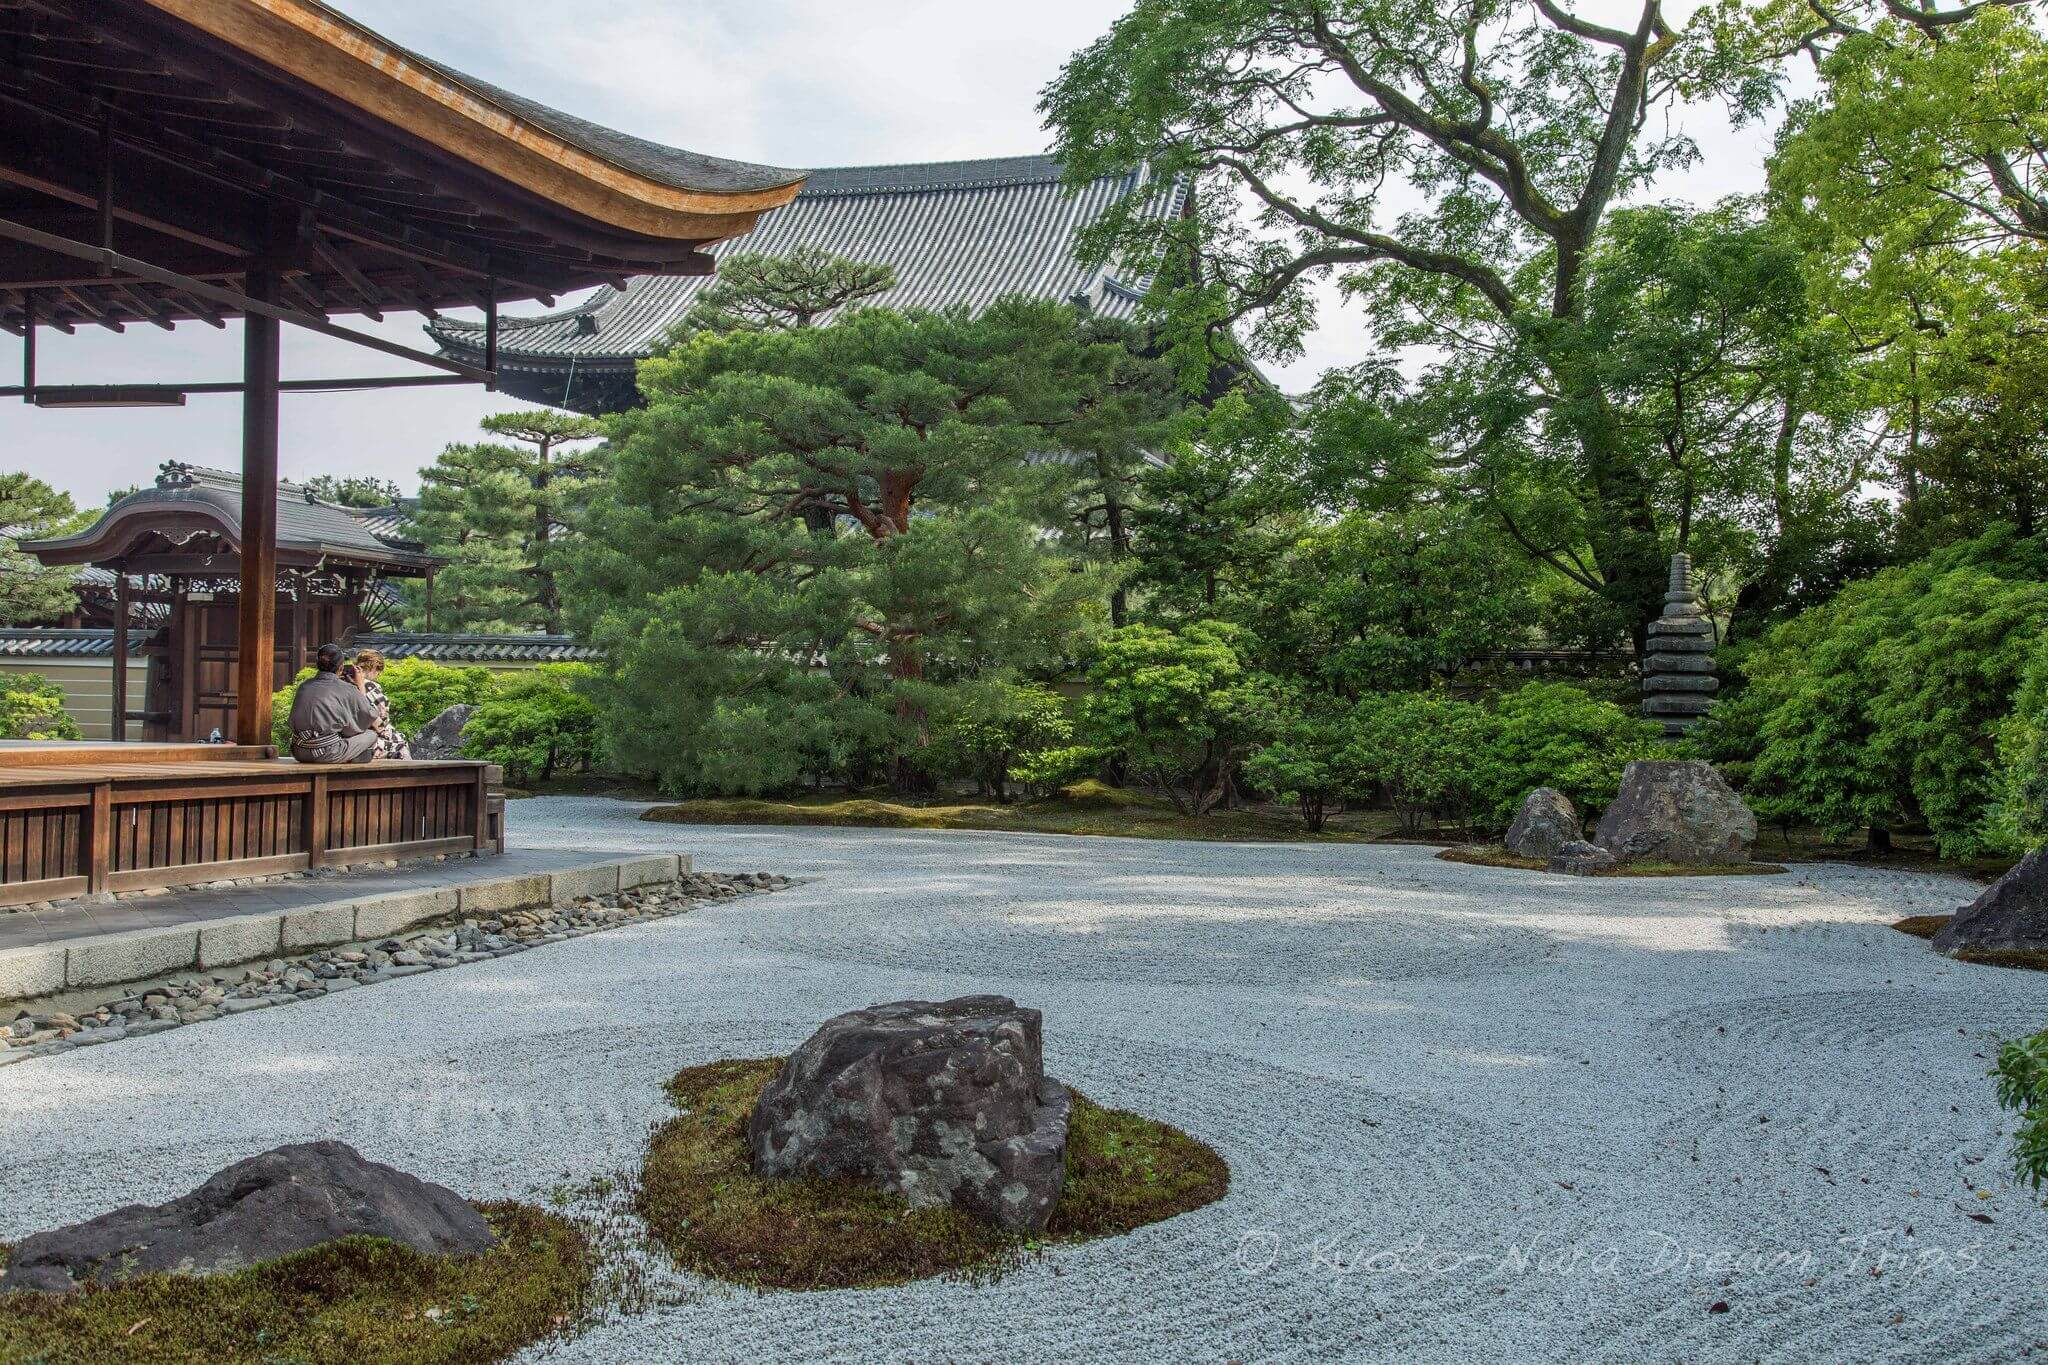 Kennin Ji templom zen kőkert - Japán, Kyoto